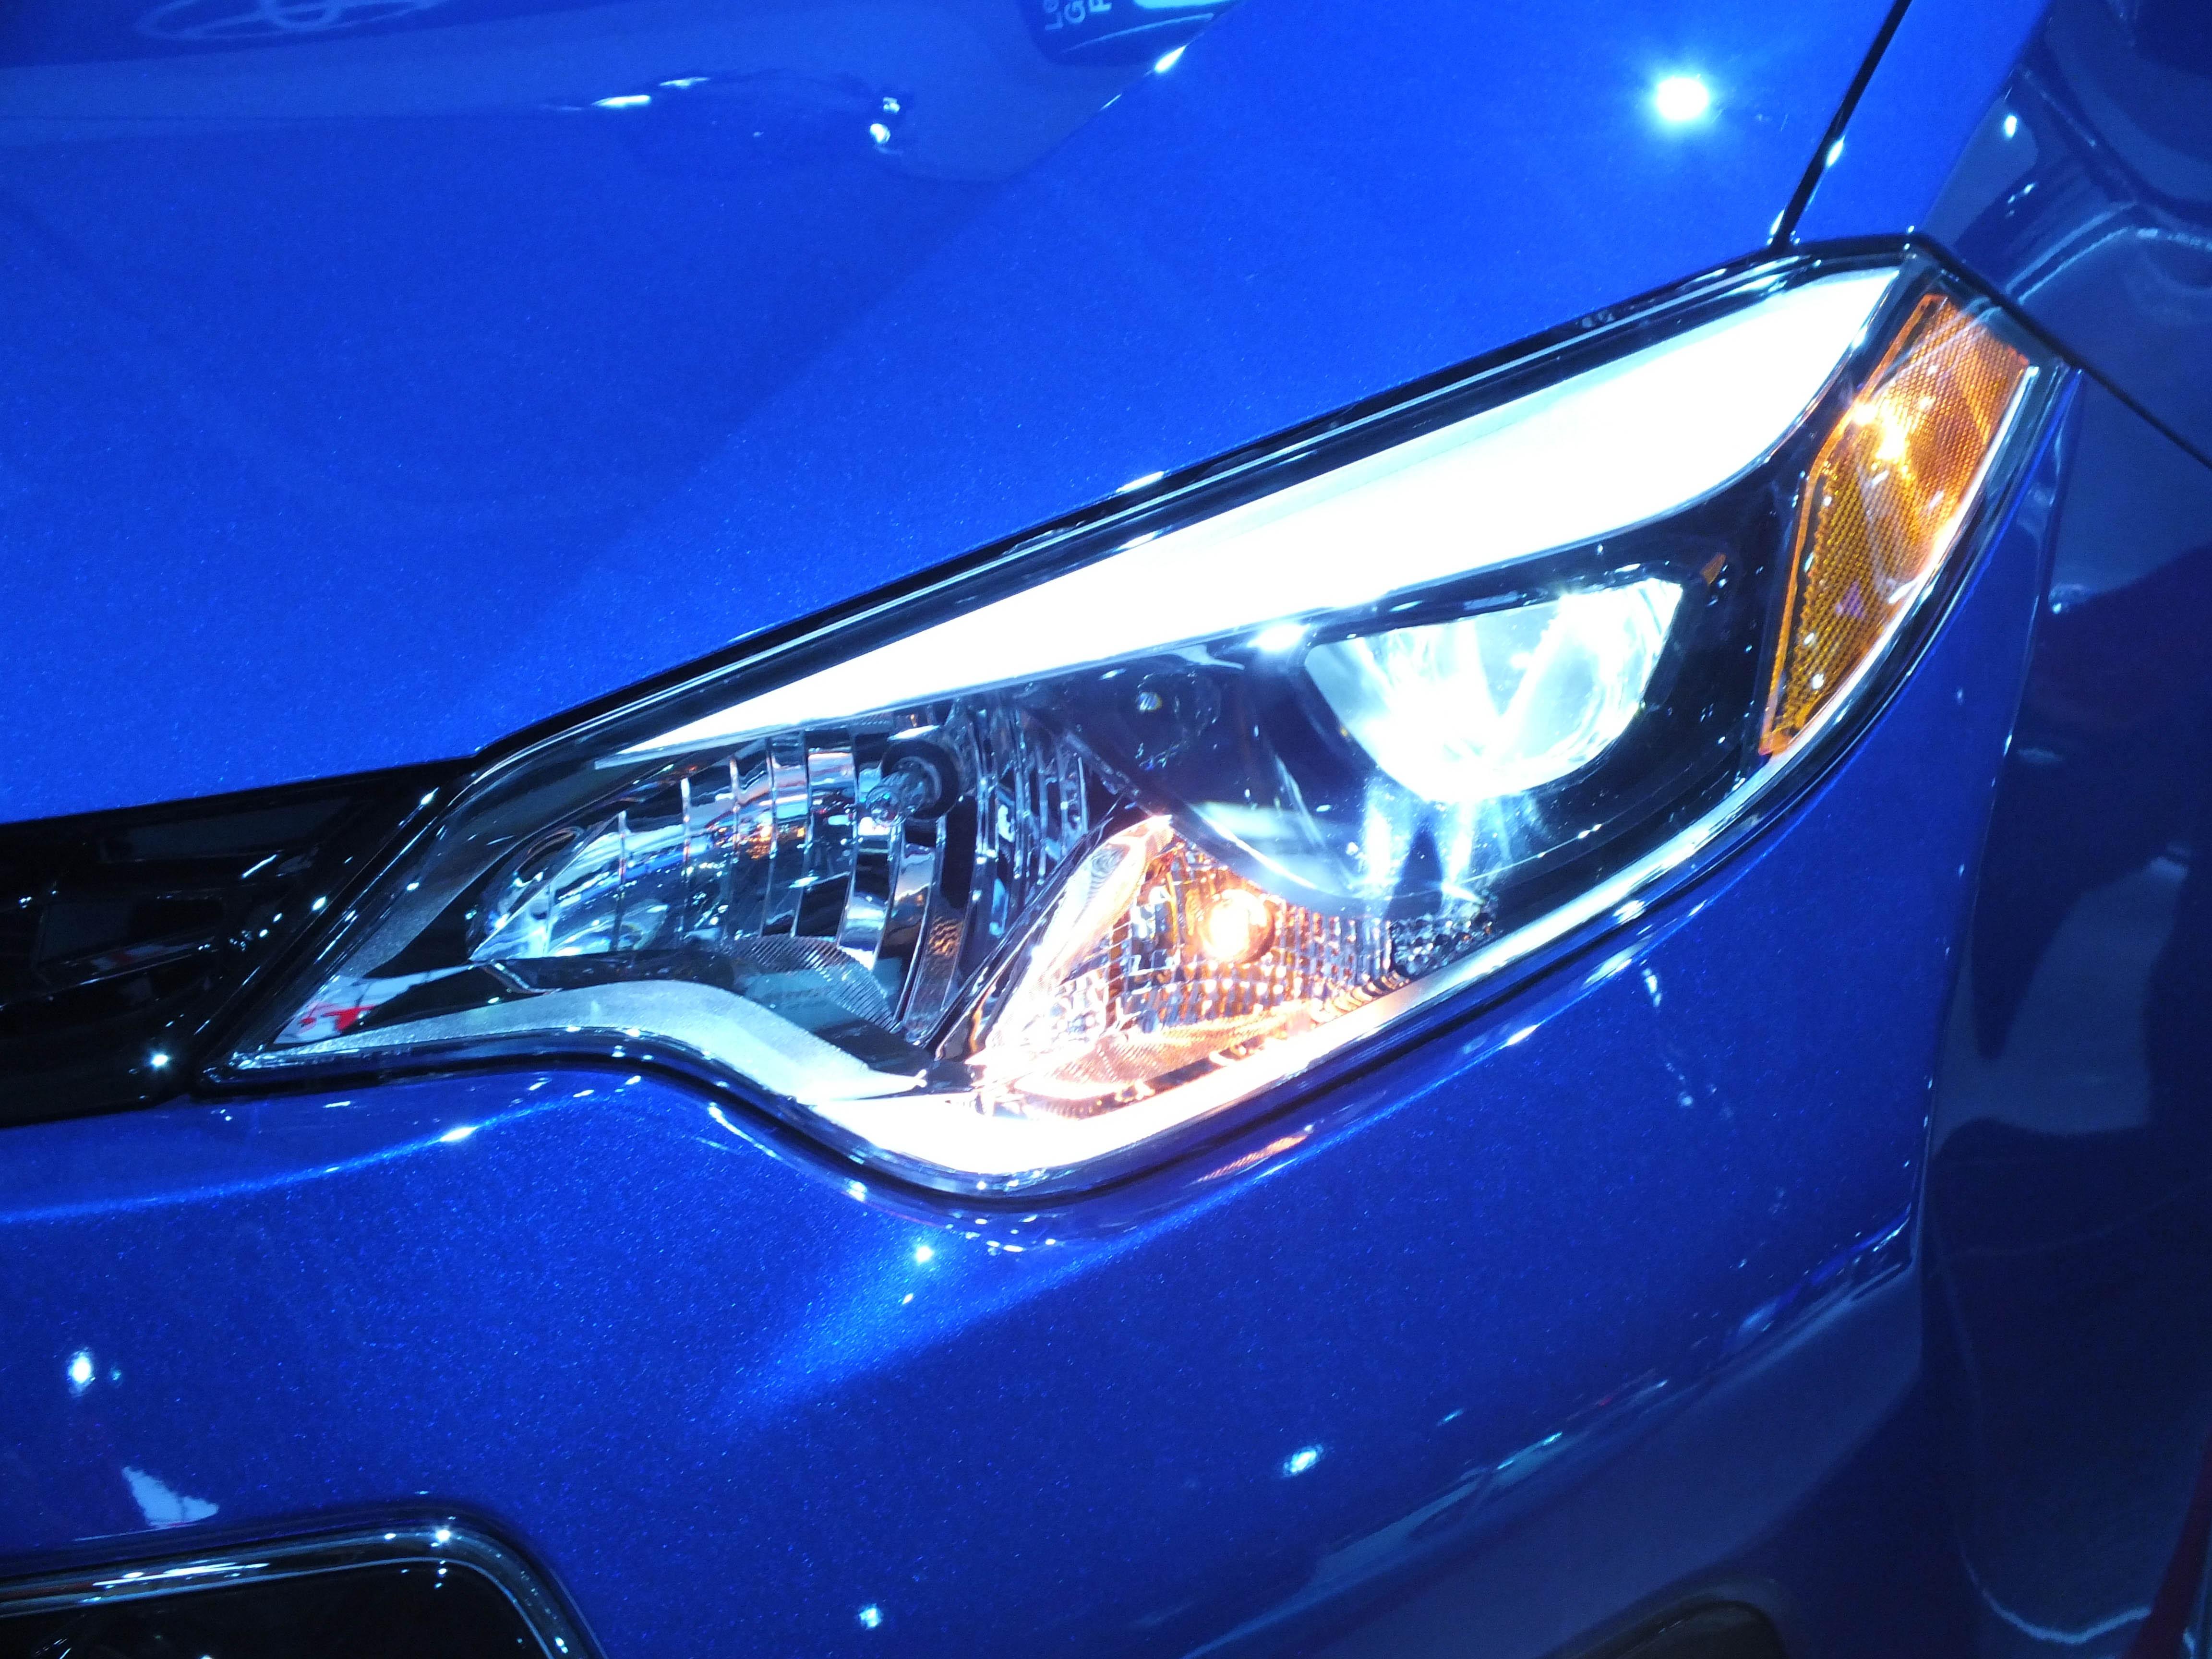 Suzuki Kizashi Headlight Replacement